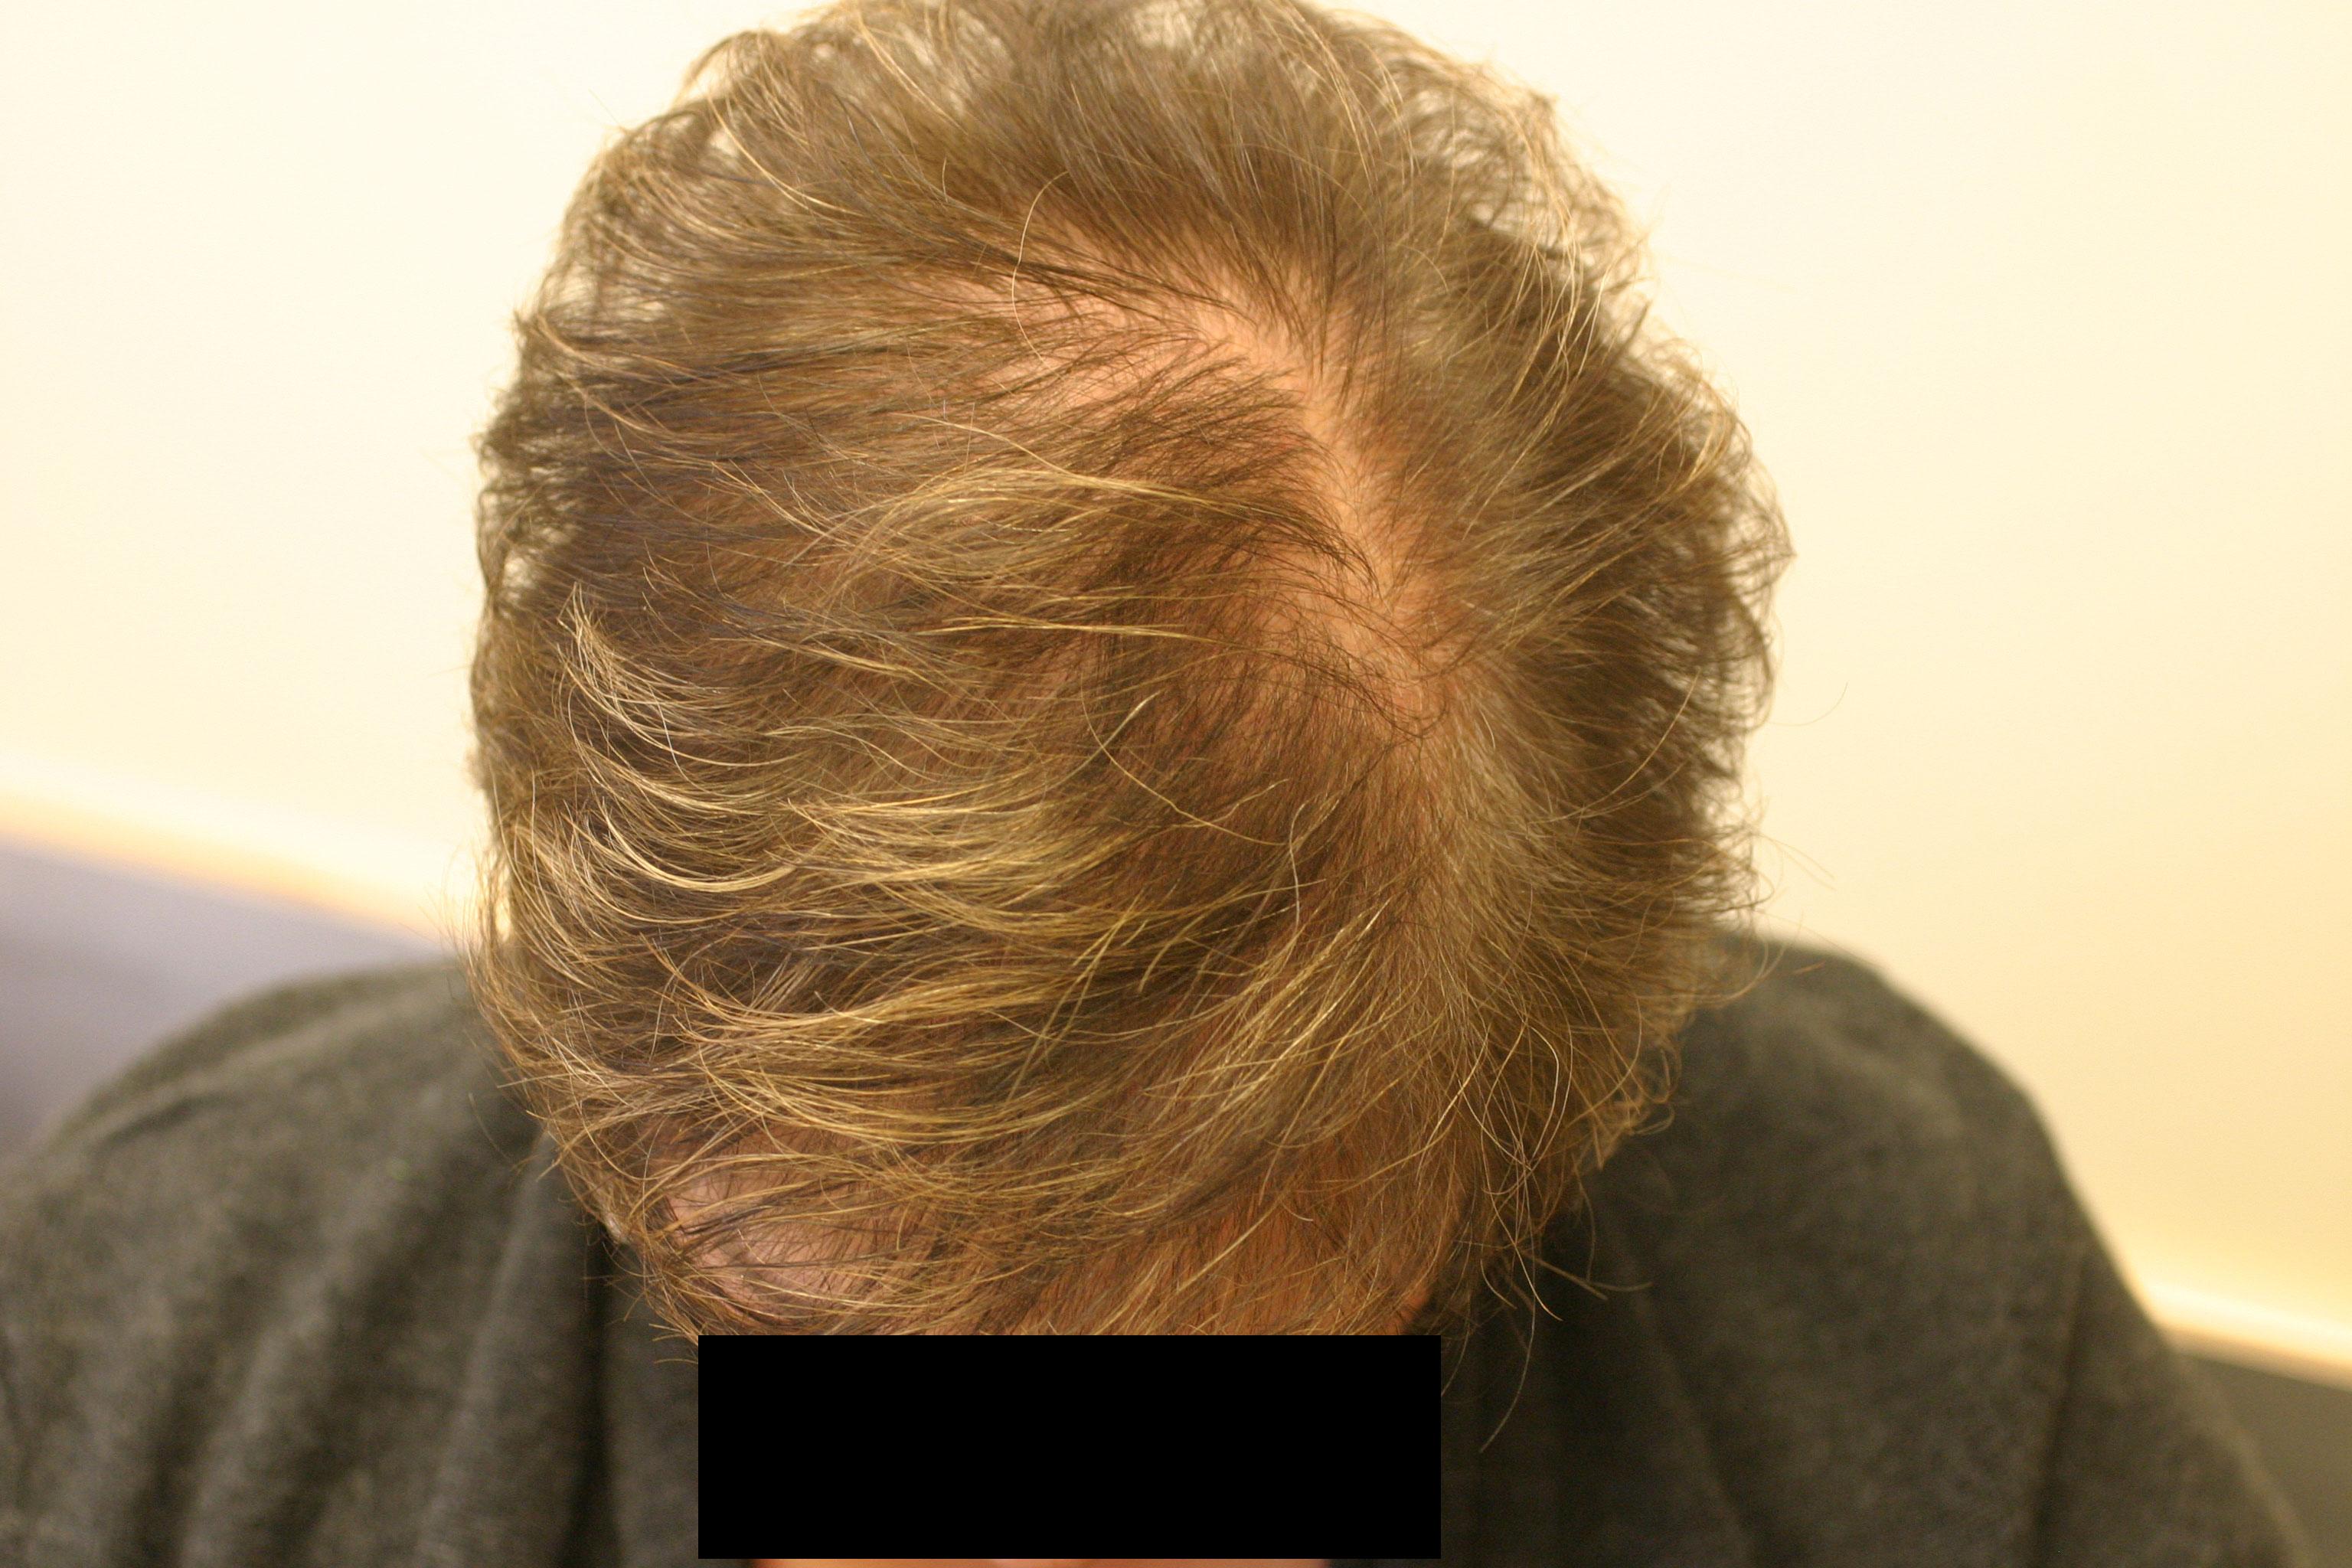 Aldactone Hair Loss